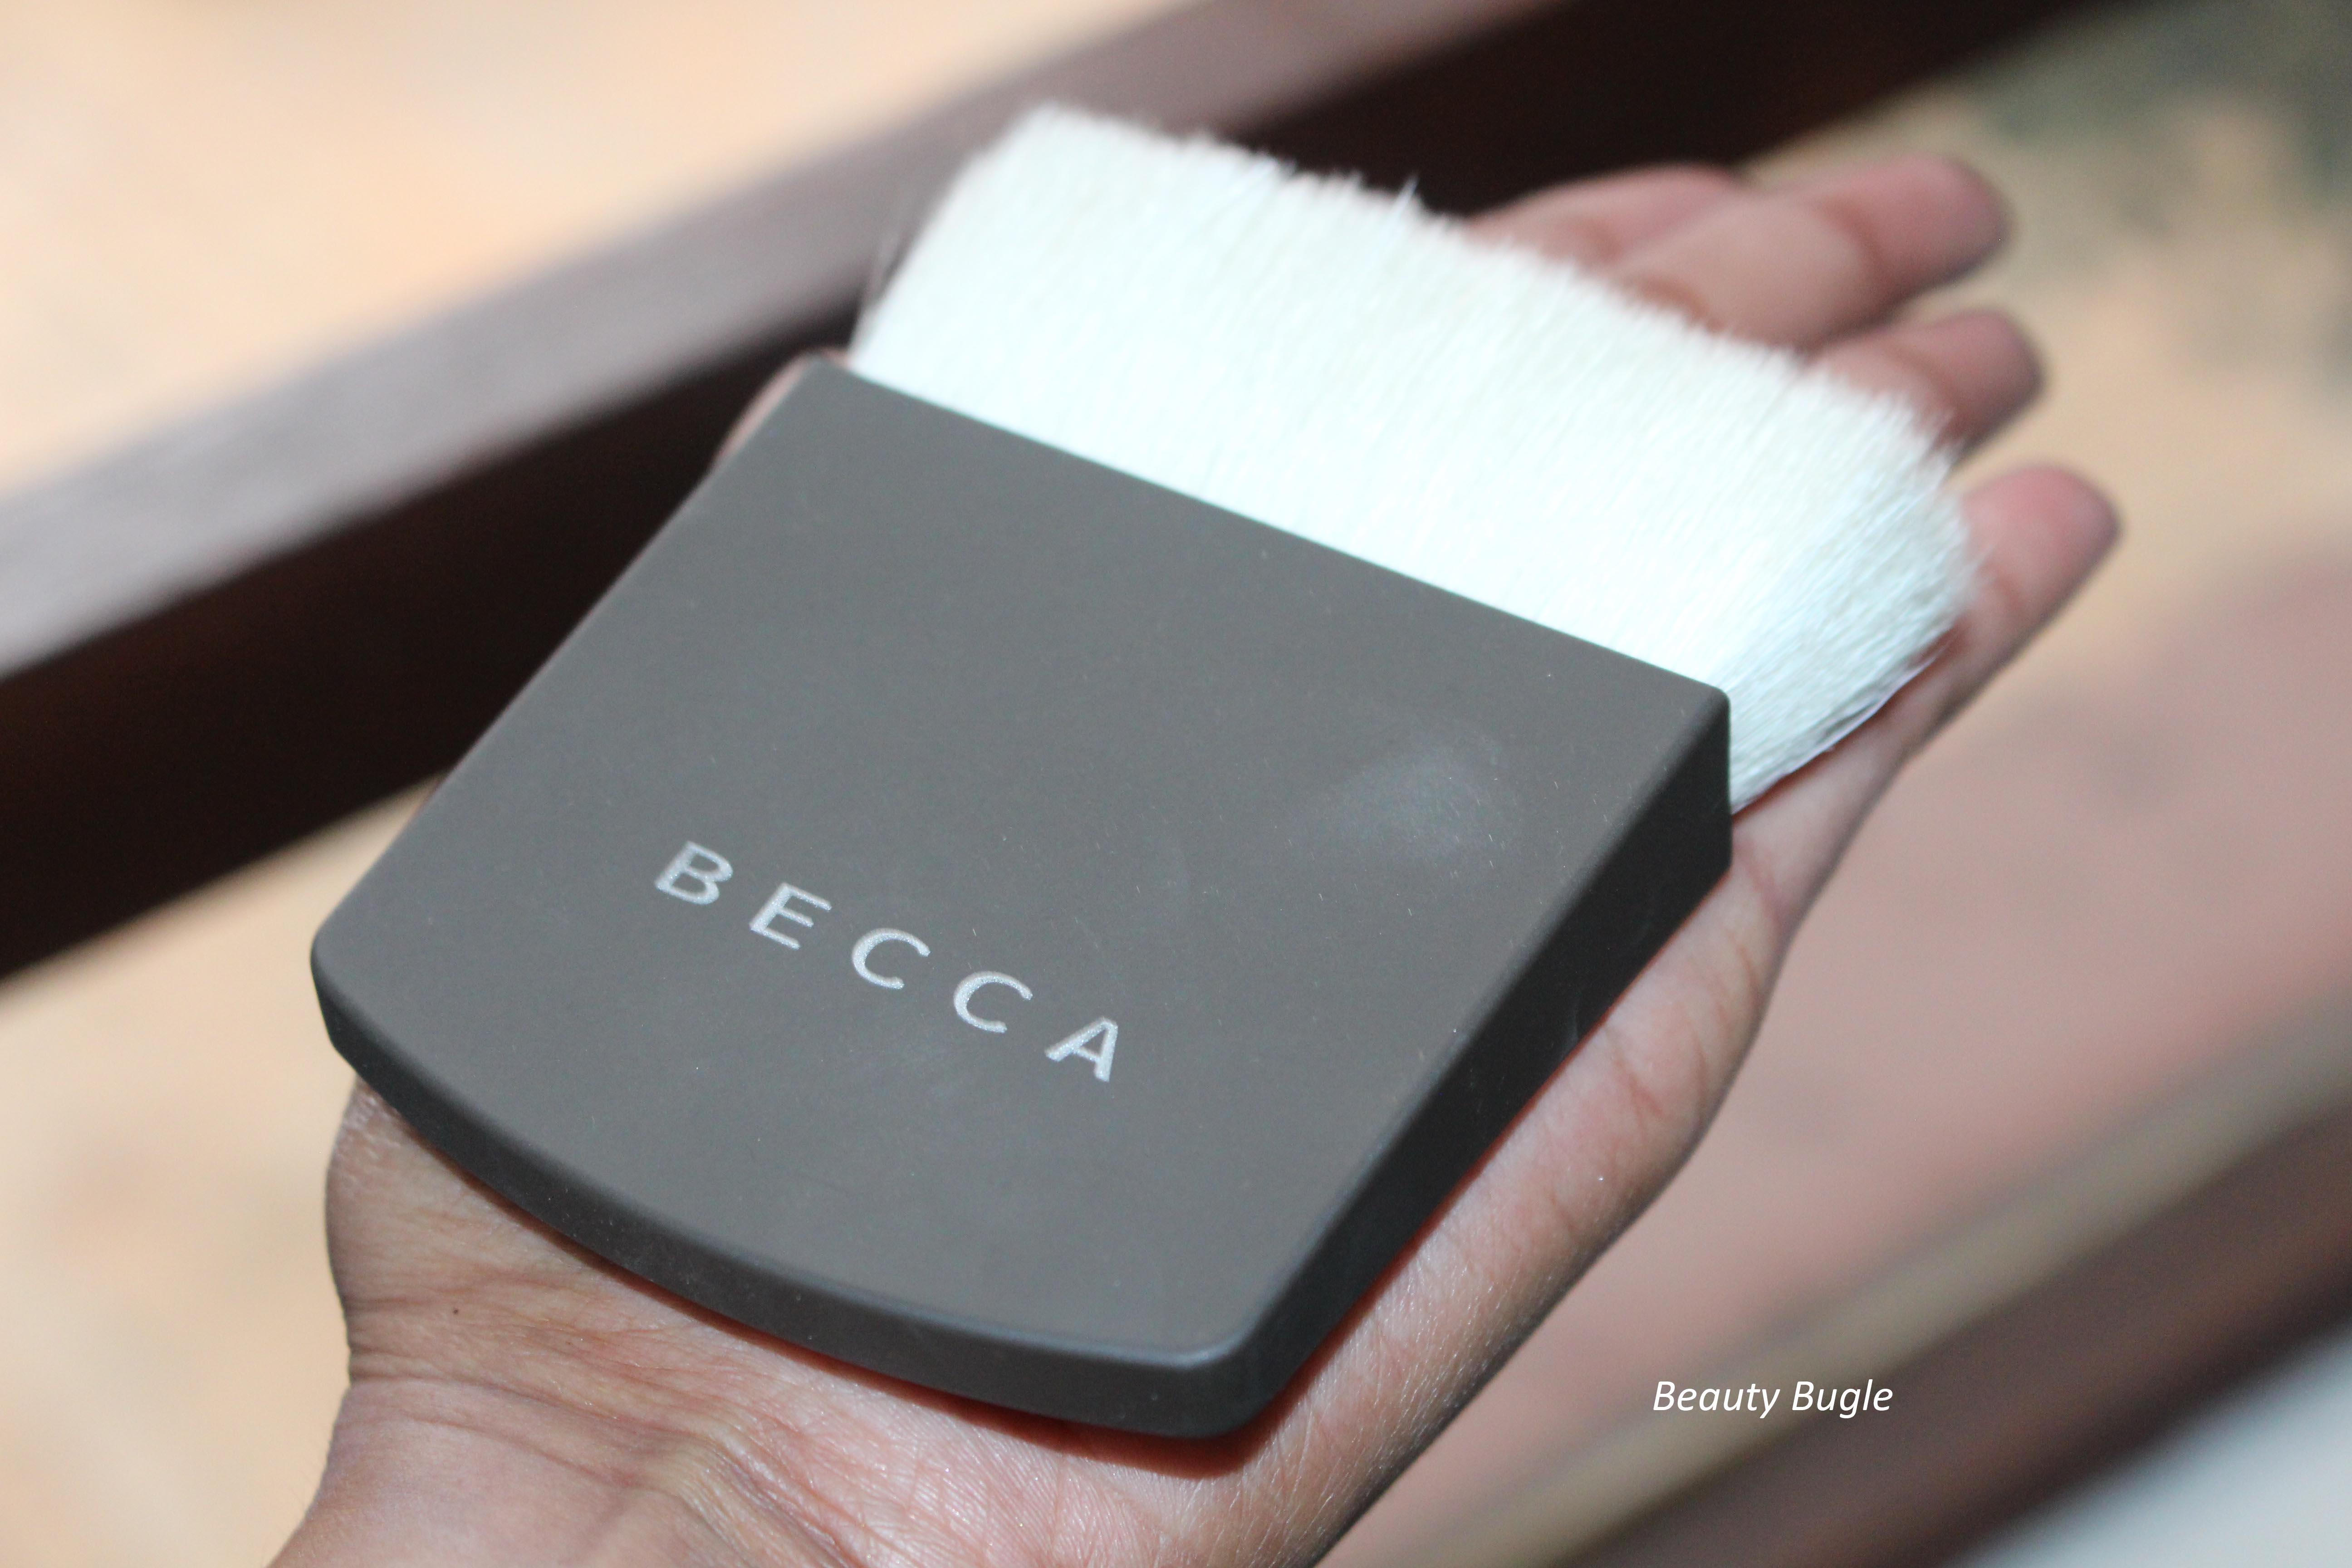 The Becca One Perfecting Brush.